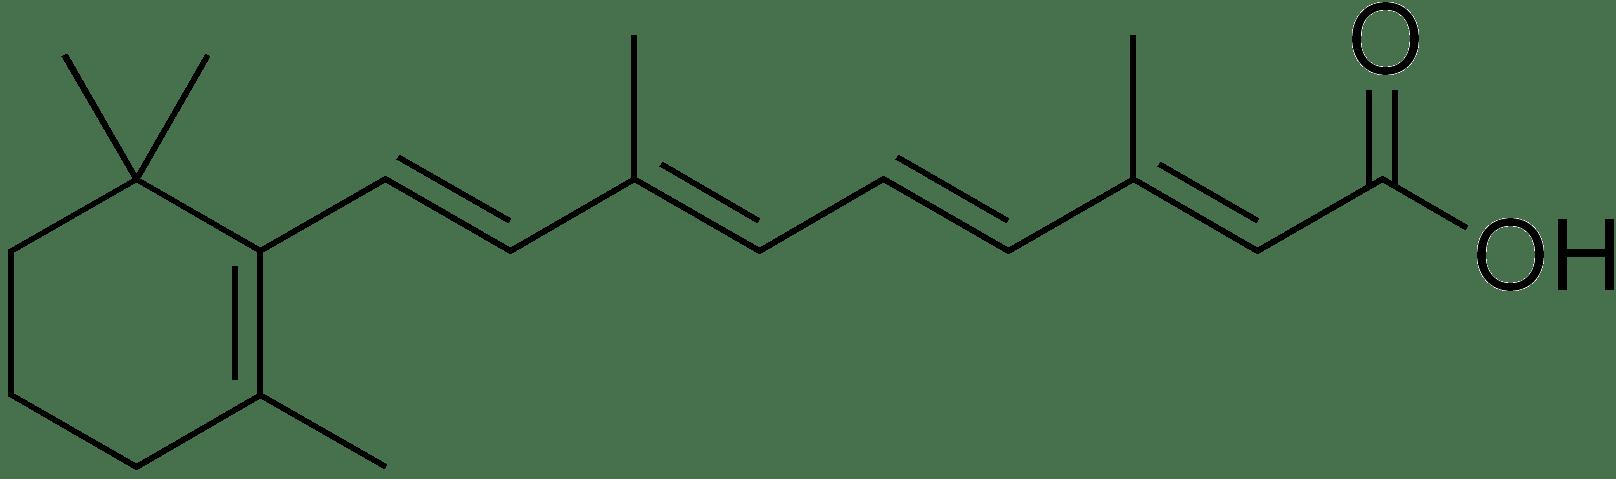 File:Retinoic acid.png - Wikipedia